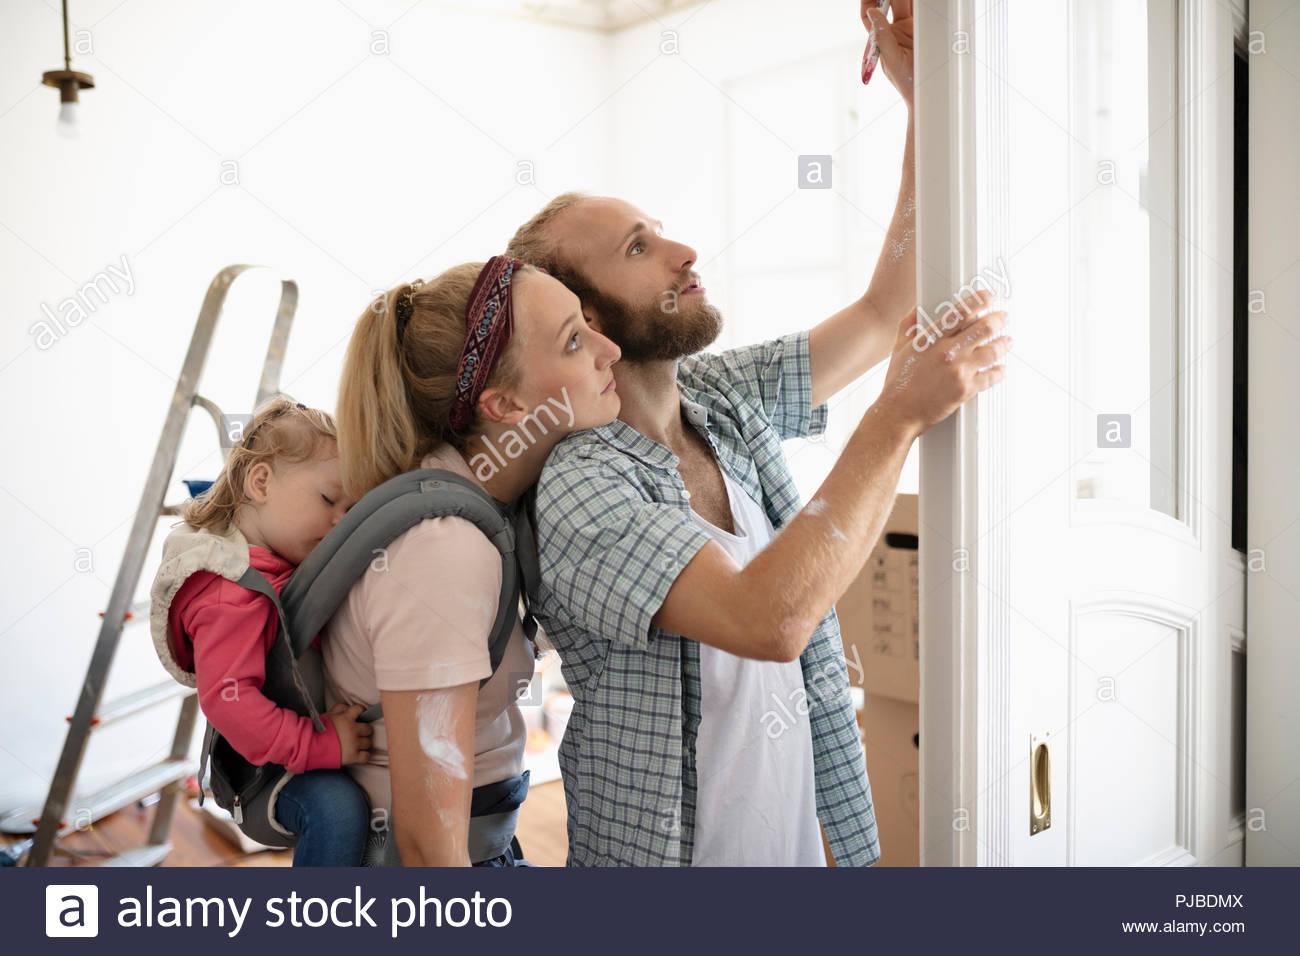 Cariñosa familia joven pintura Imagen De Stock